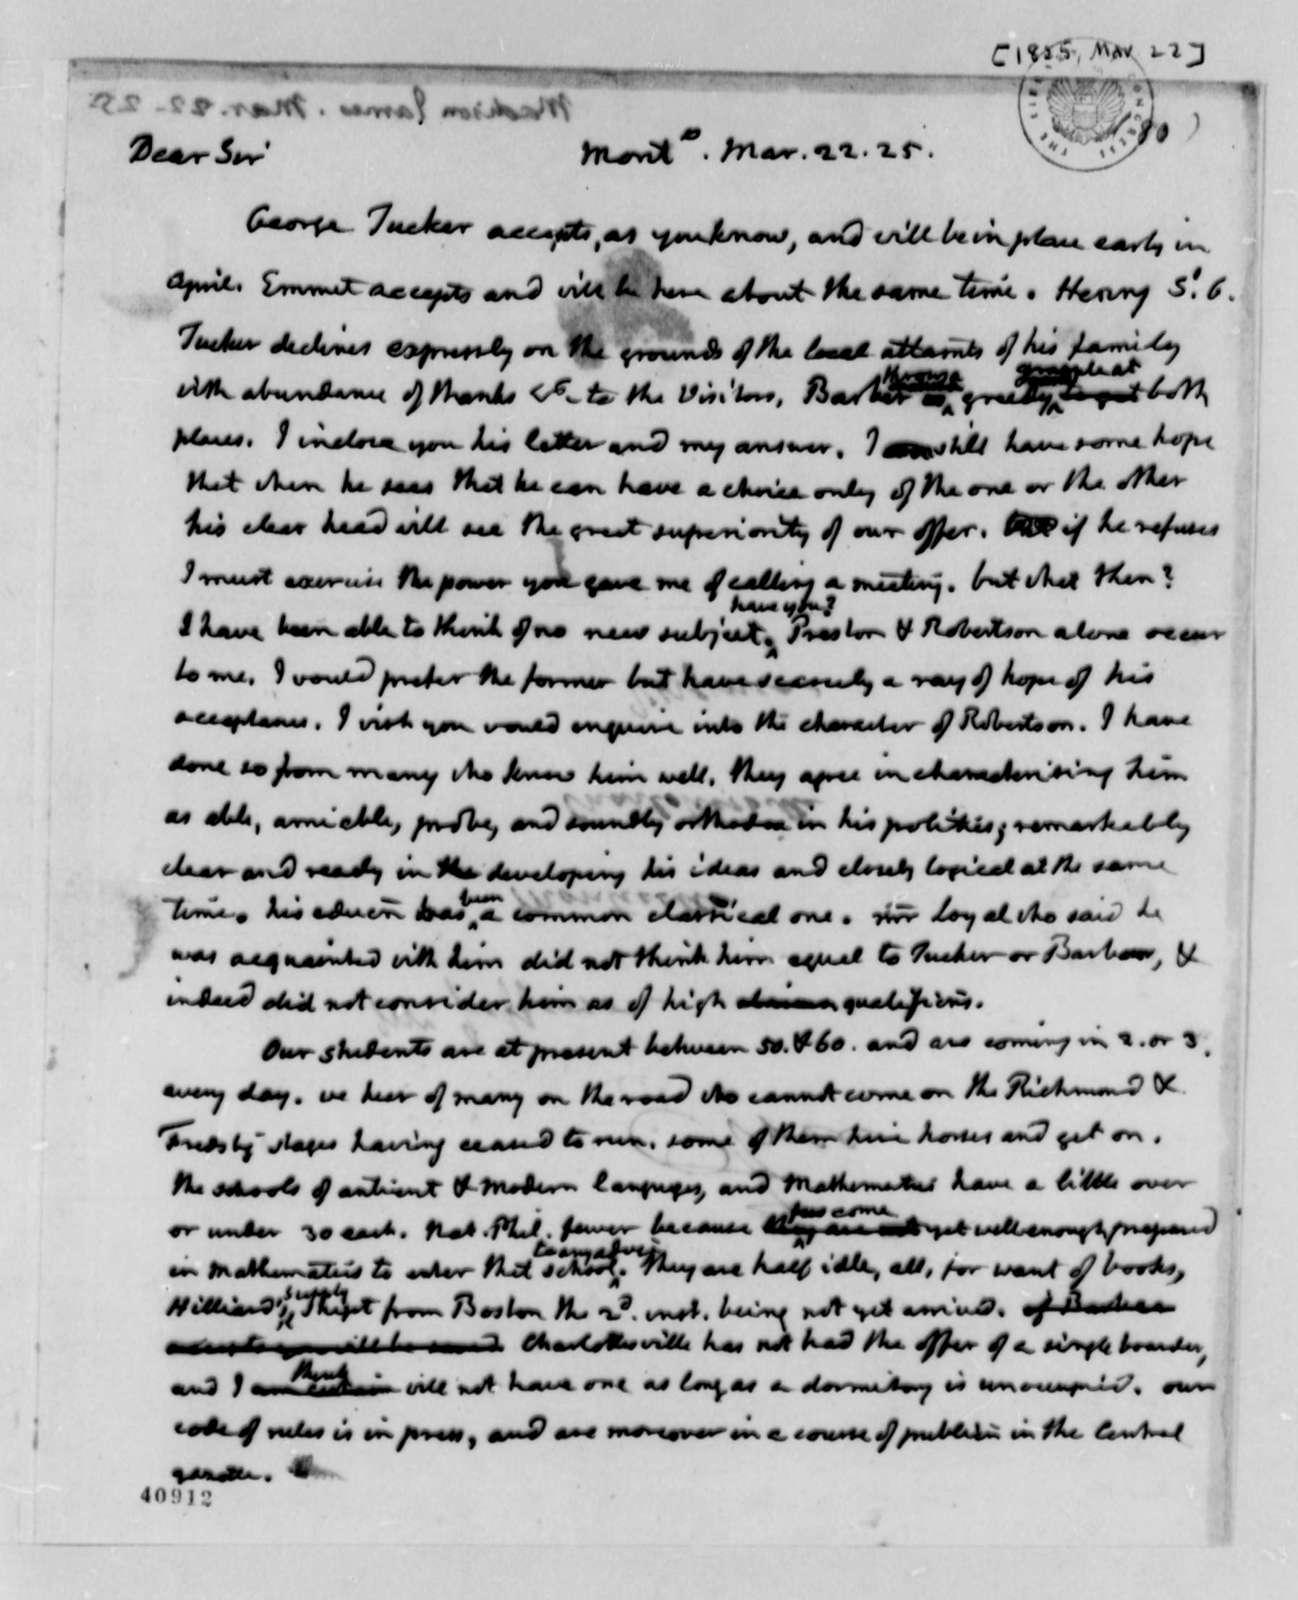 Thomas Jefferson to James Madison, March 22, 1825